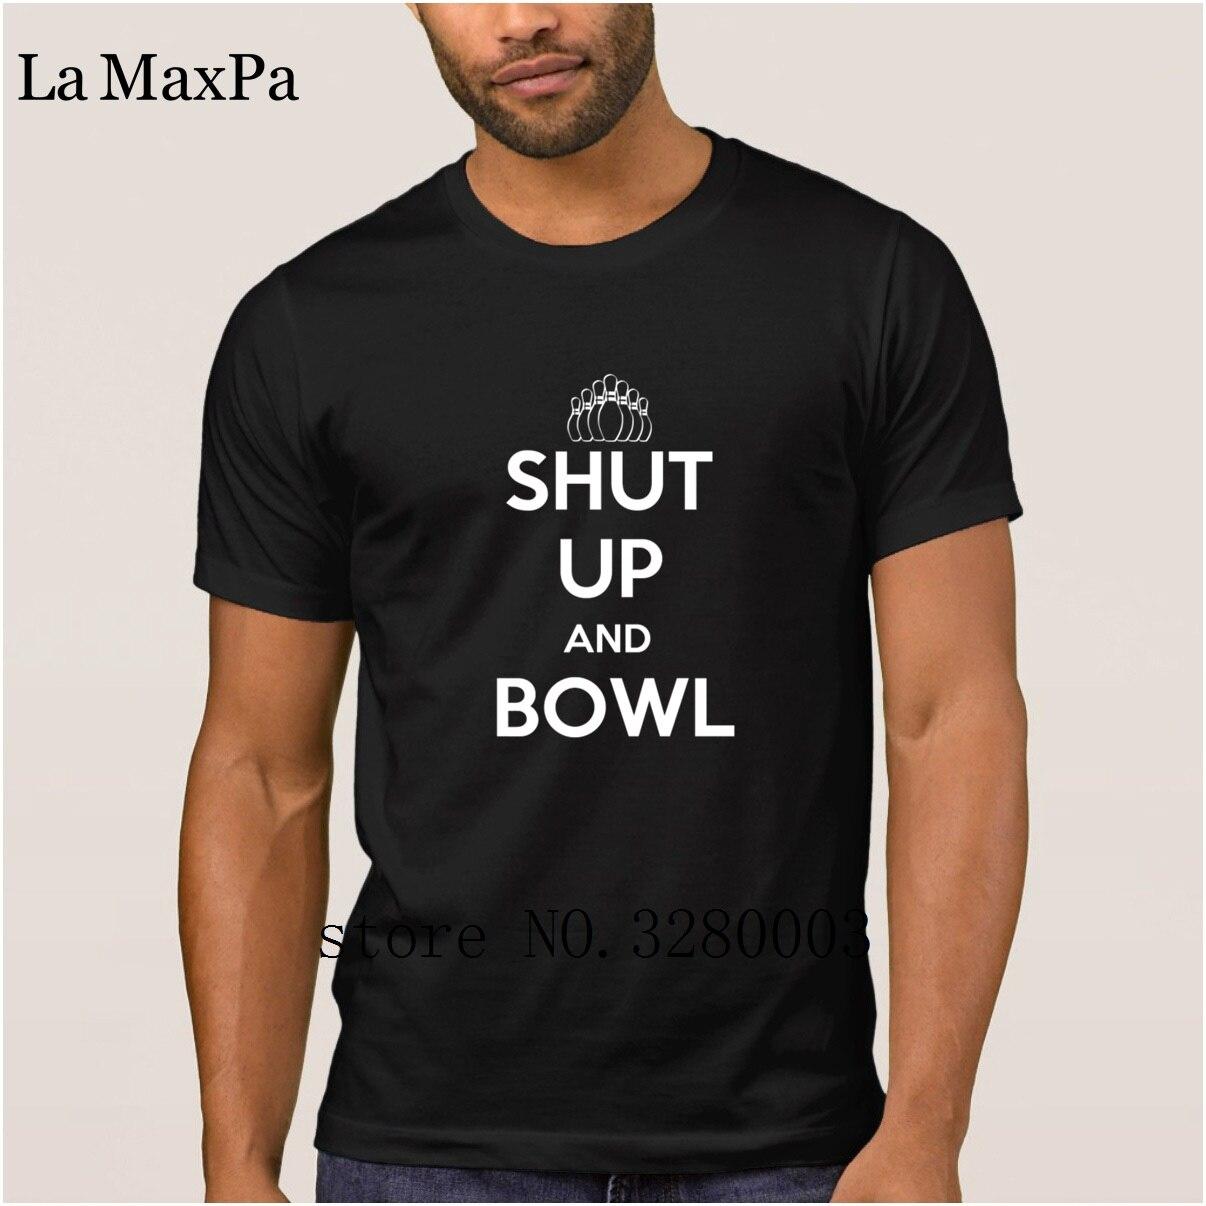 La Maxpa Costume Super men t shirt shut up and bowls t-shirt 2018 Pattern tee shirt man Basic Solid HipHop Tops